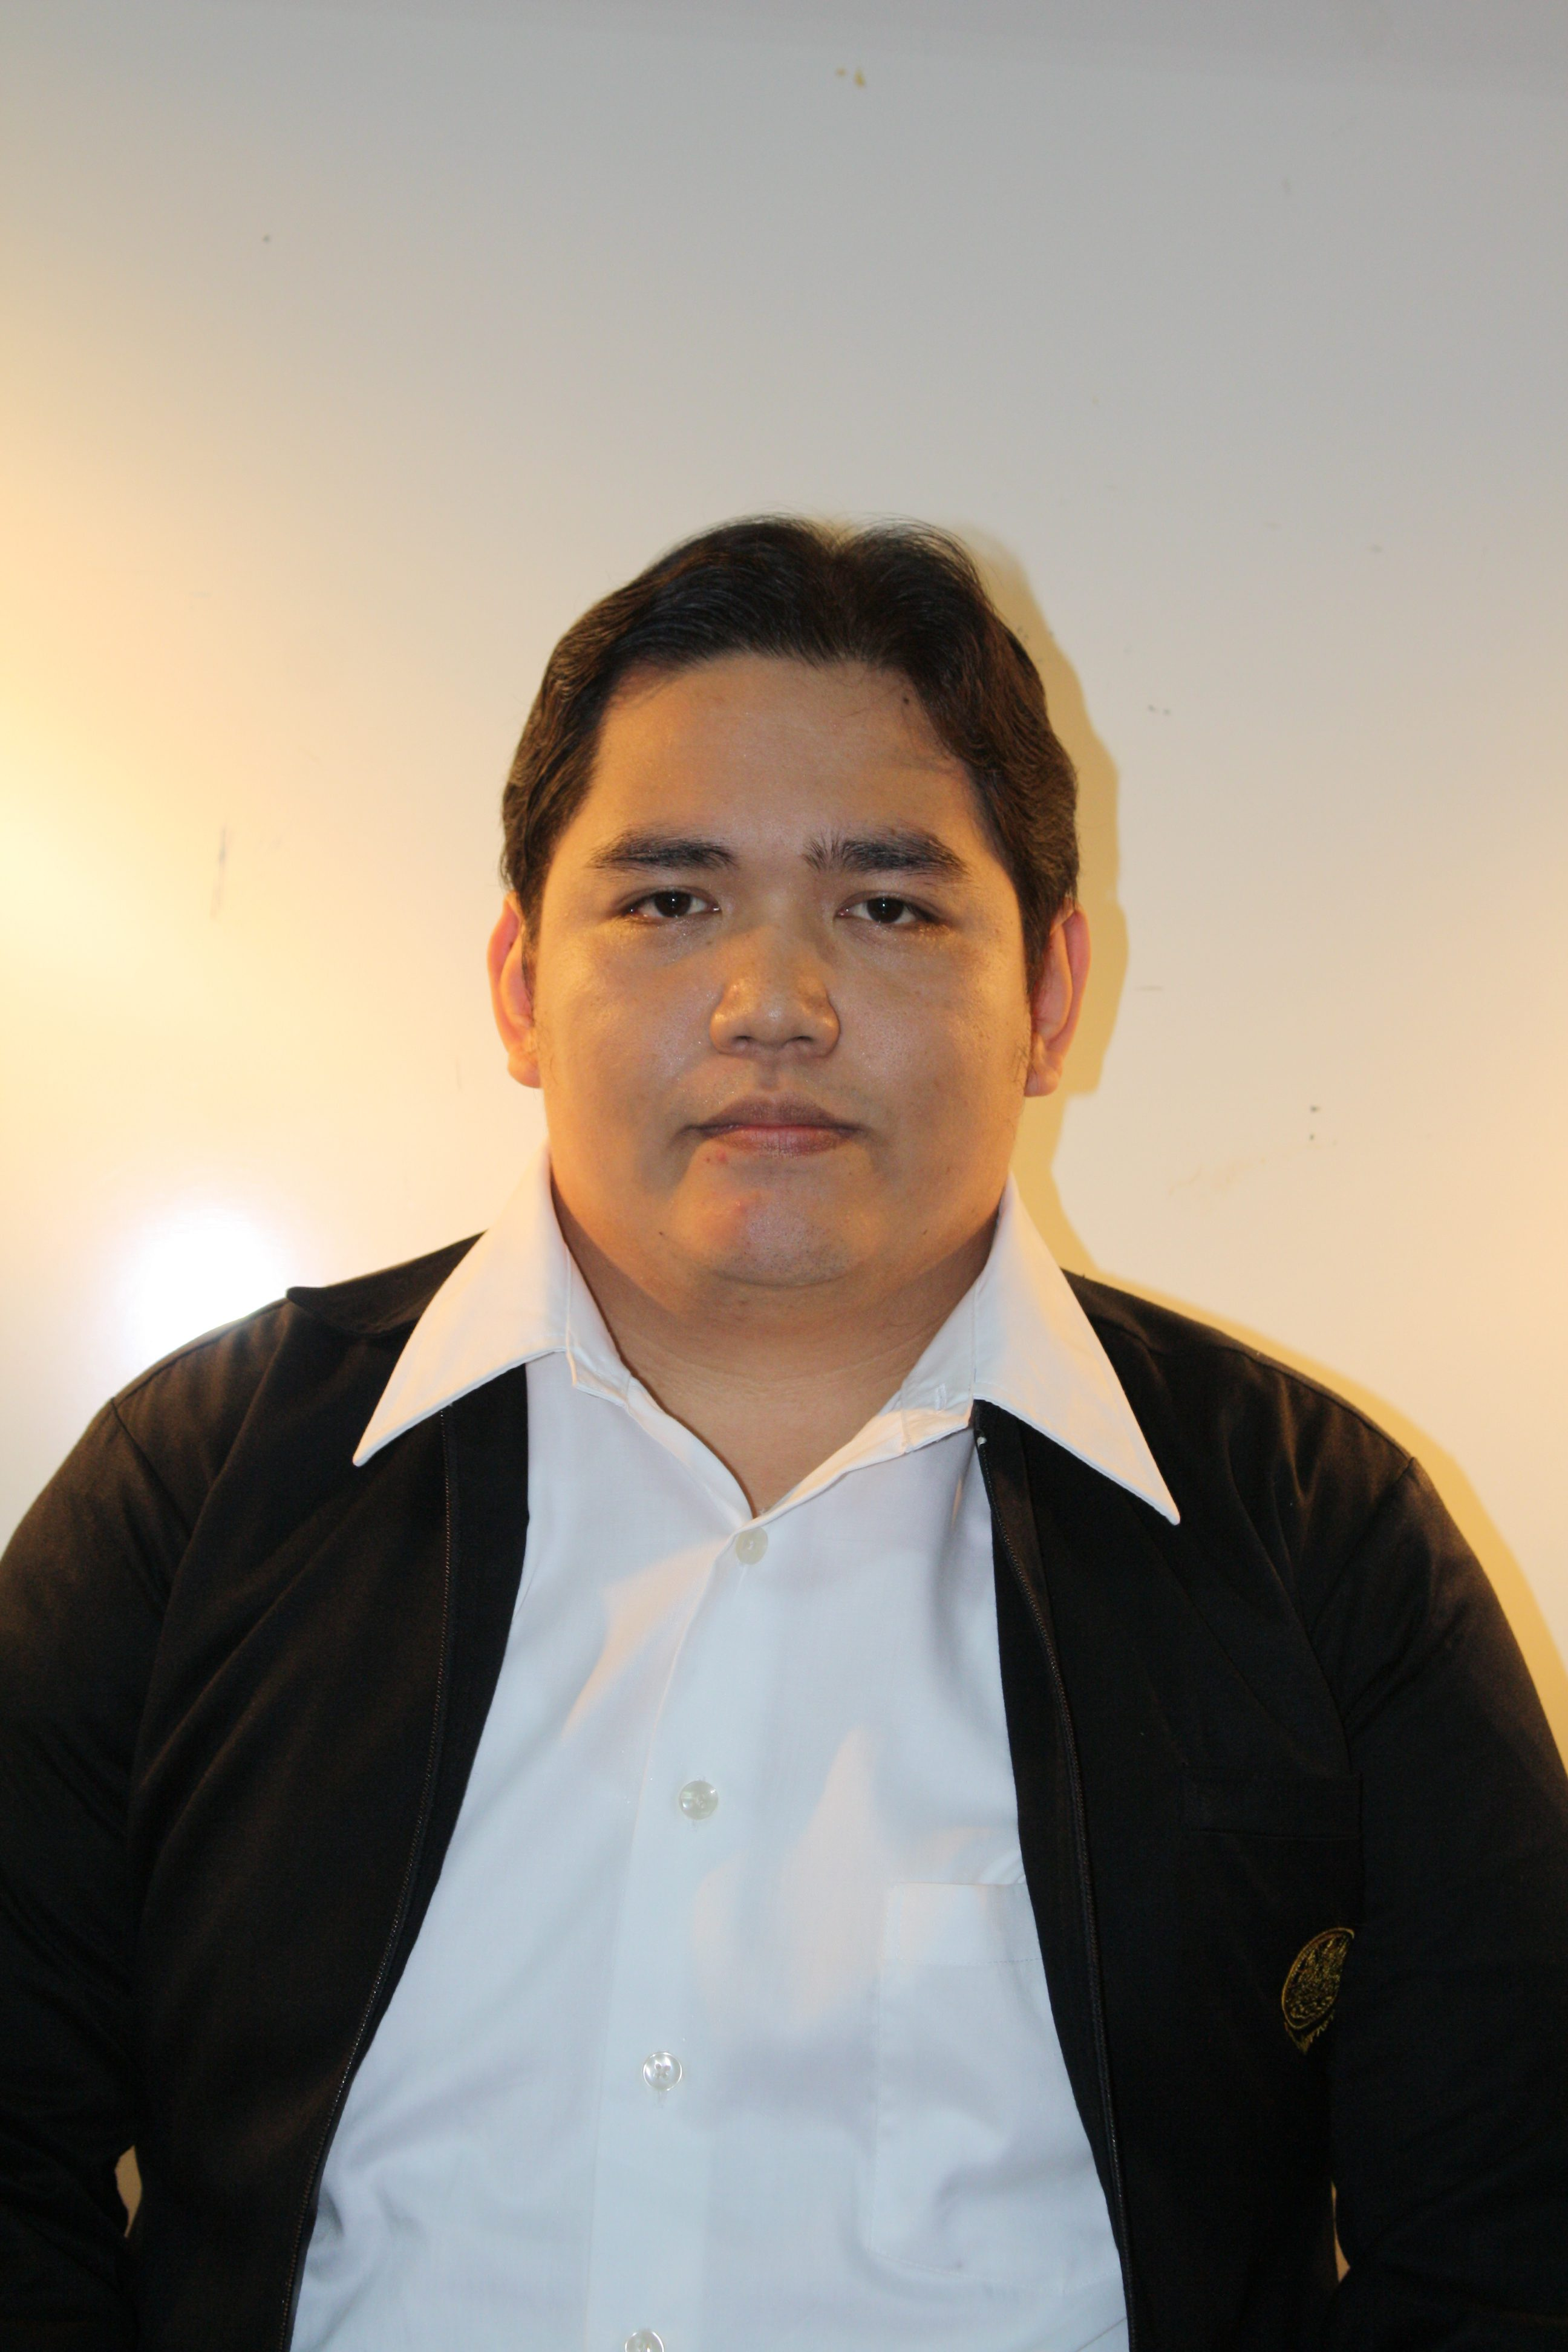 Mr. Sukkapon Nonthagaew